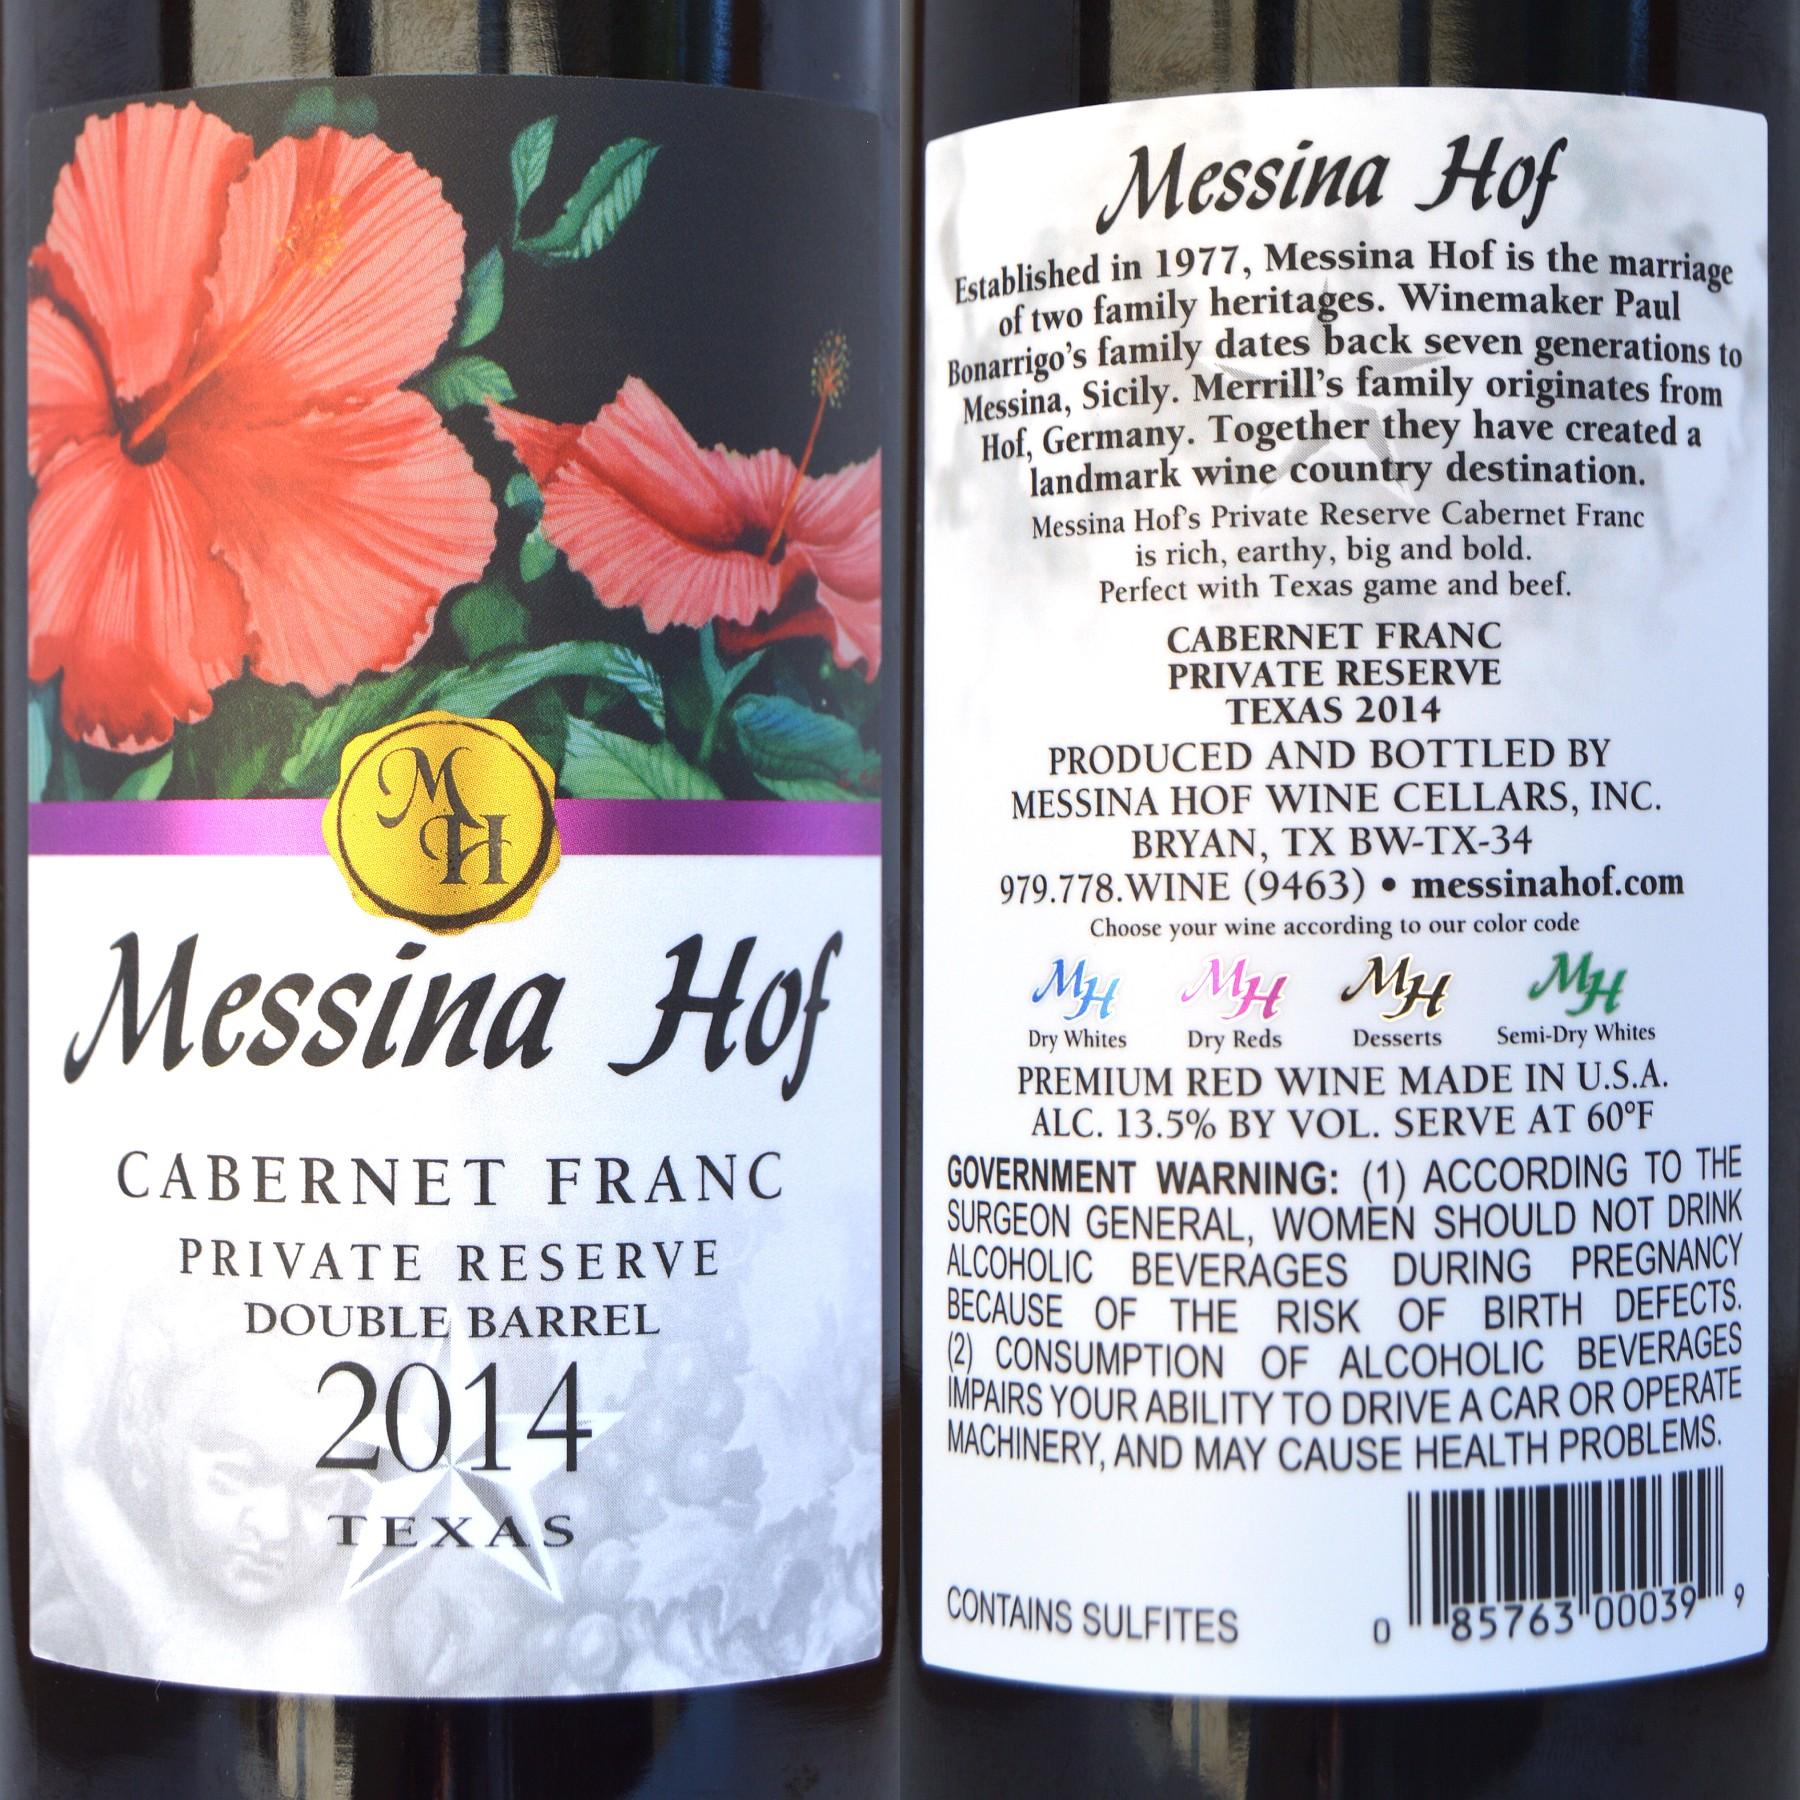 Messina Hof Cabernet Franc labels